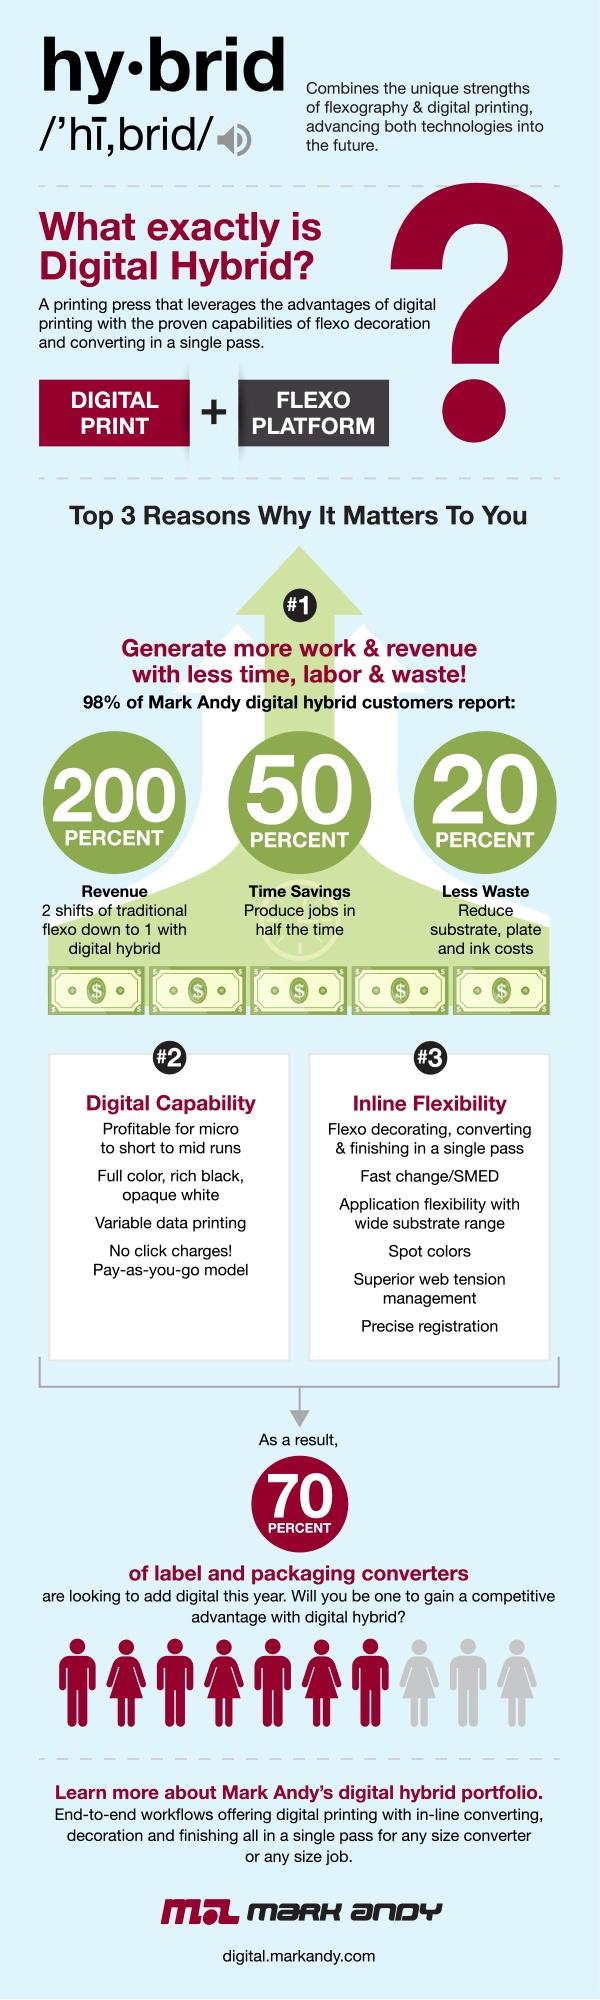 Meaning-of-Digital-Hybrid-Printing_Infographic.jpg